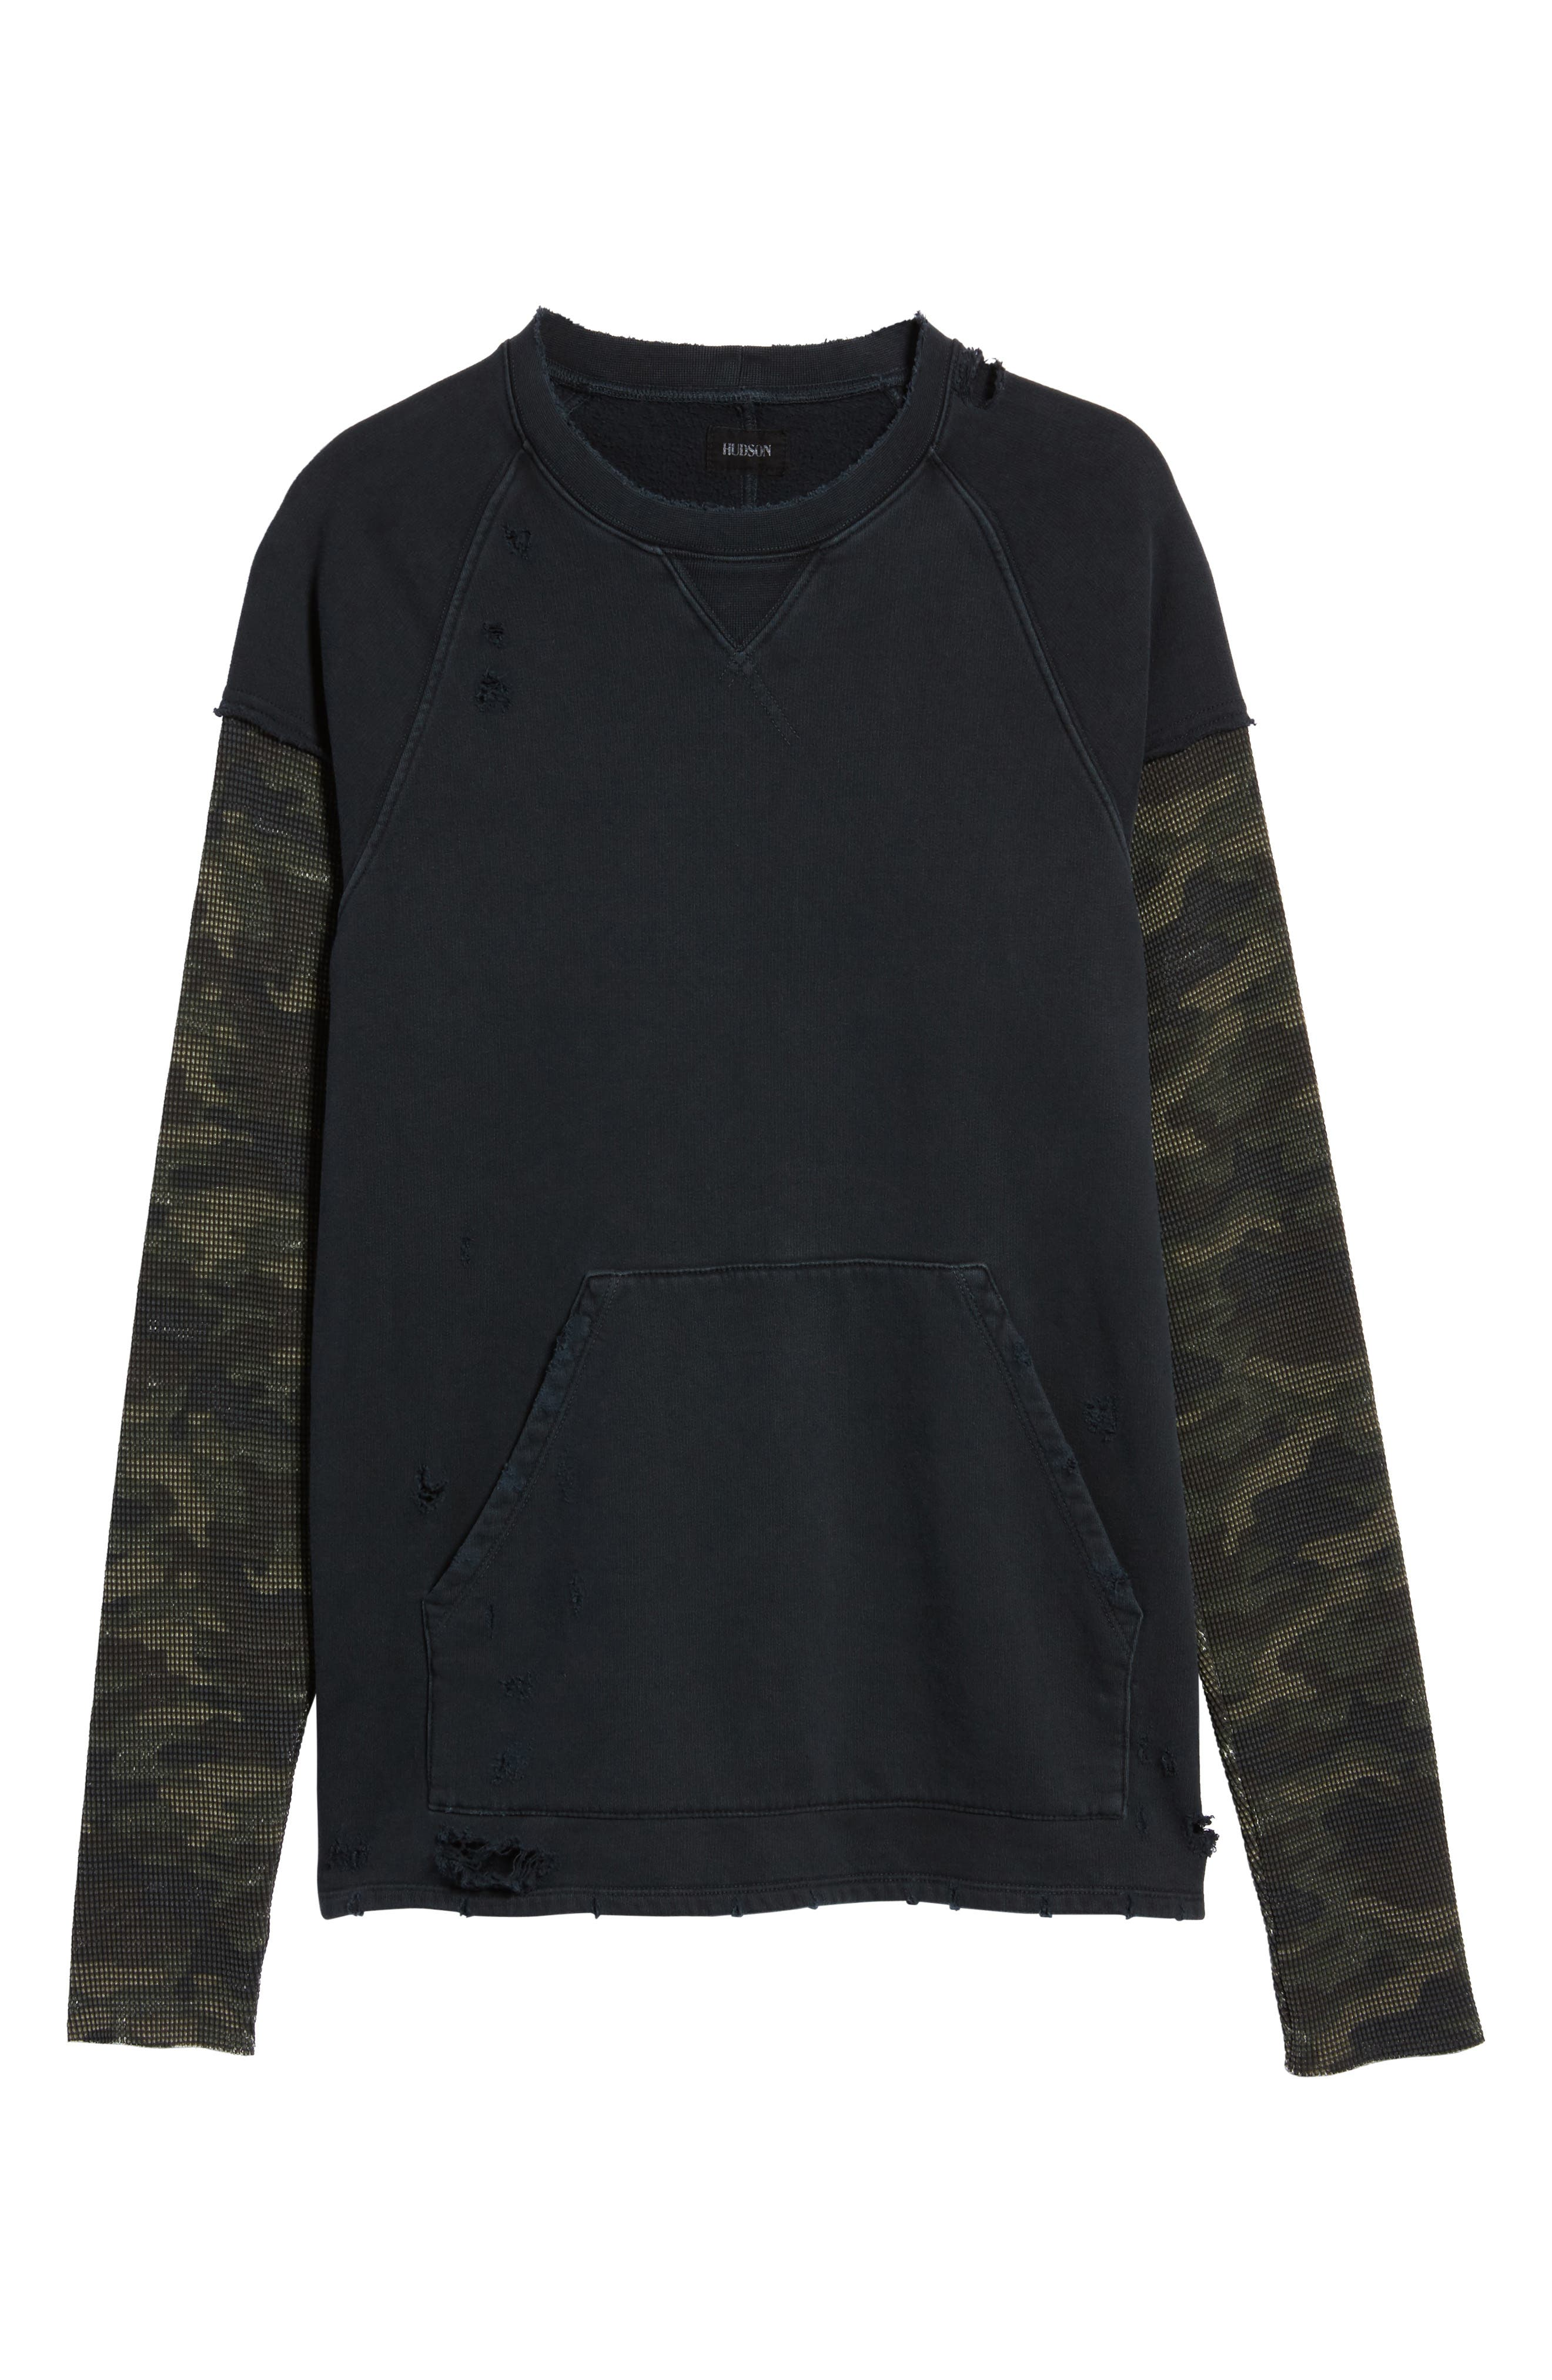 Striker Slim Fit Crewneck Sweatshirt,                             Alternate thumbnail 6, color,